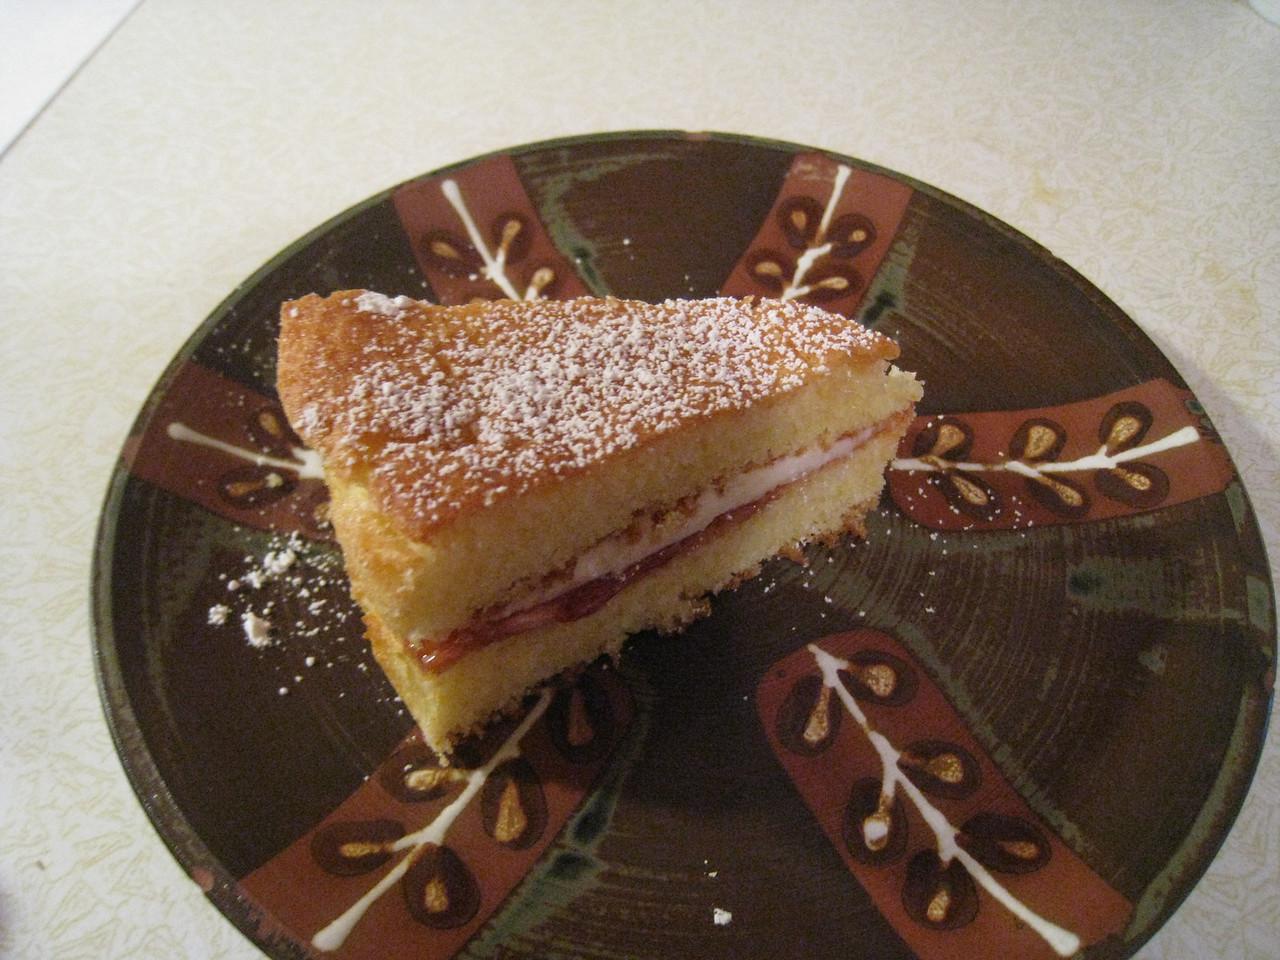 Chiyoko's home made Victoria Sponge Cake.